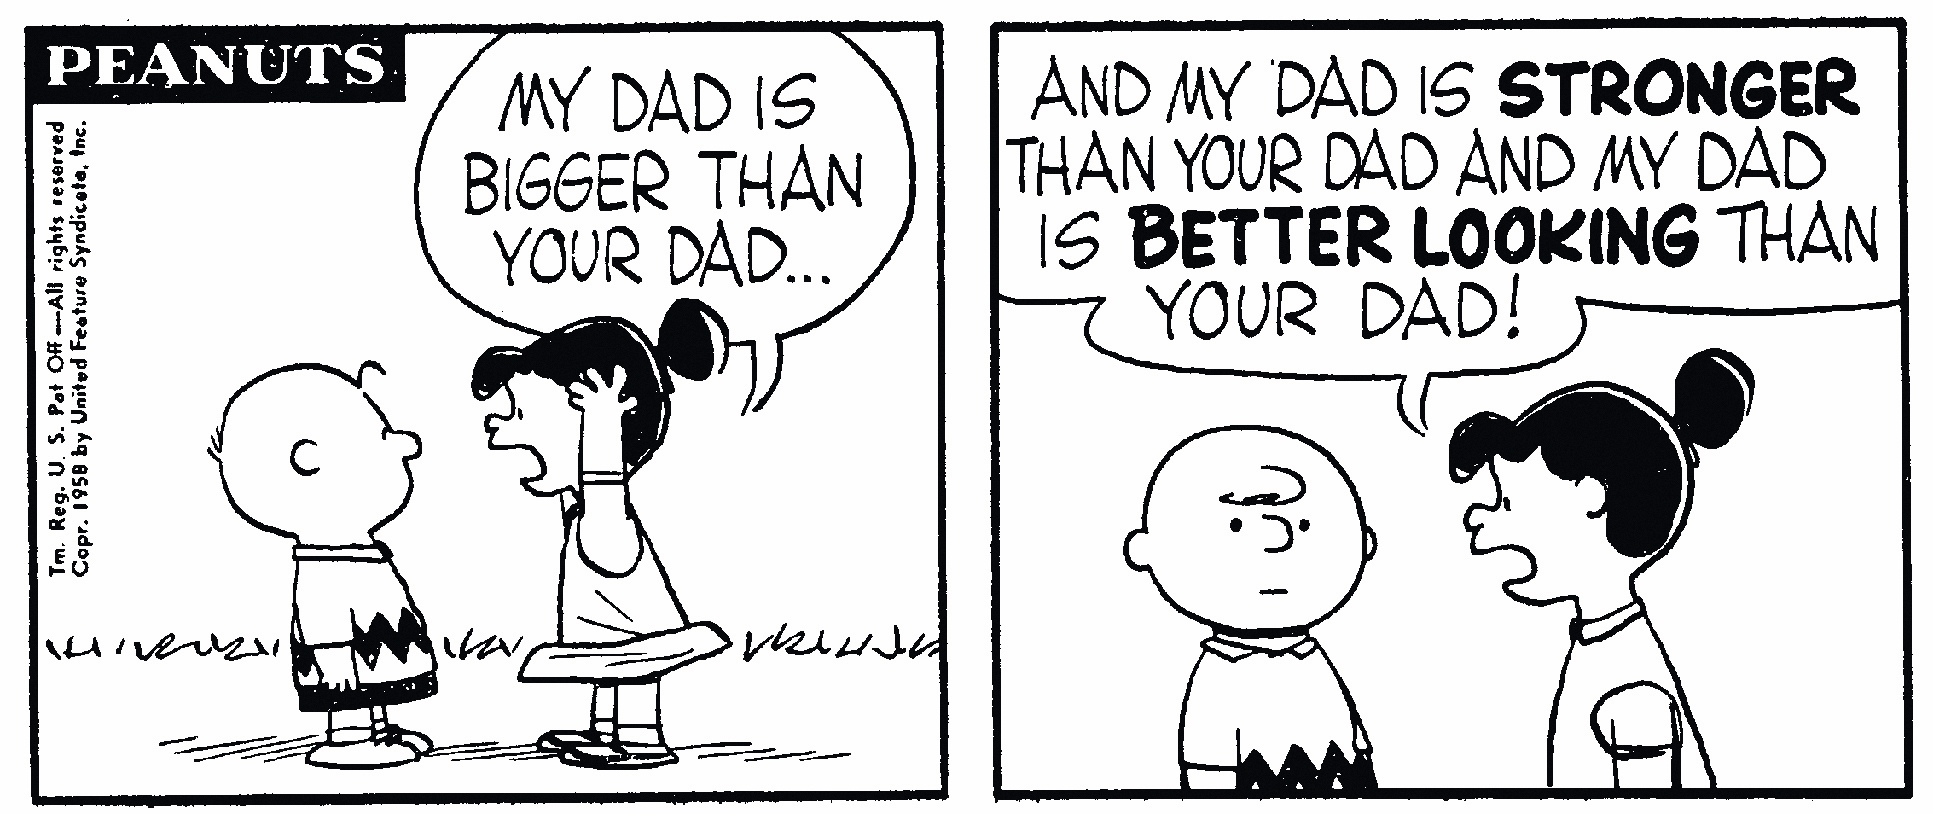 Cartoon Peanuts by Charles Schultz